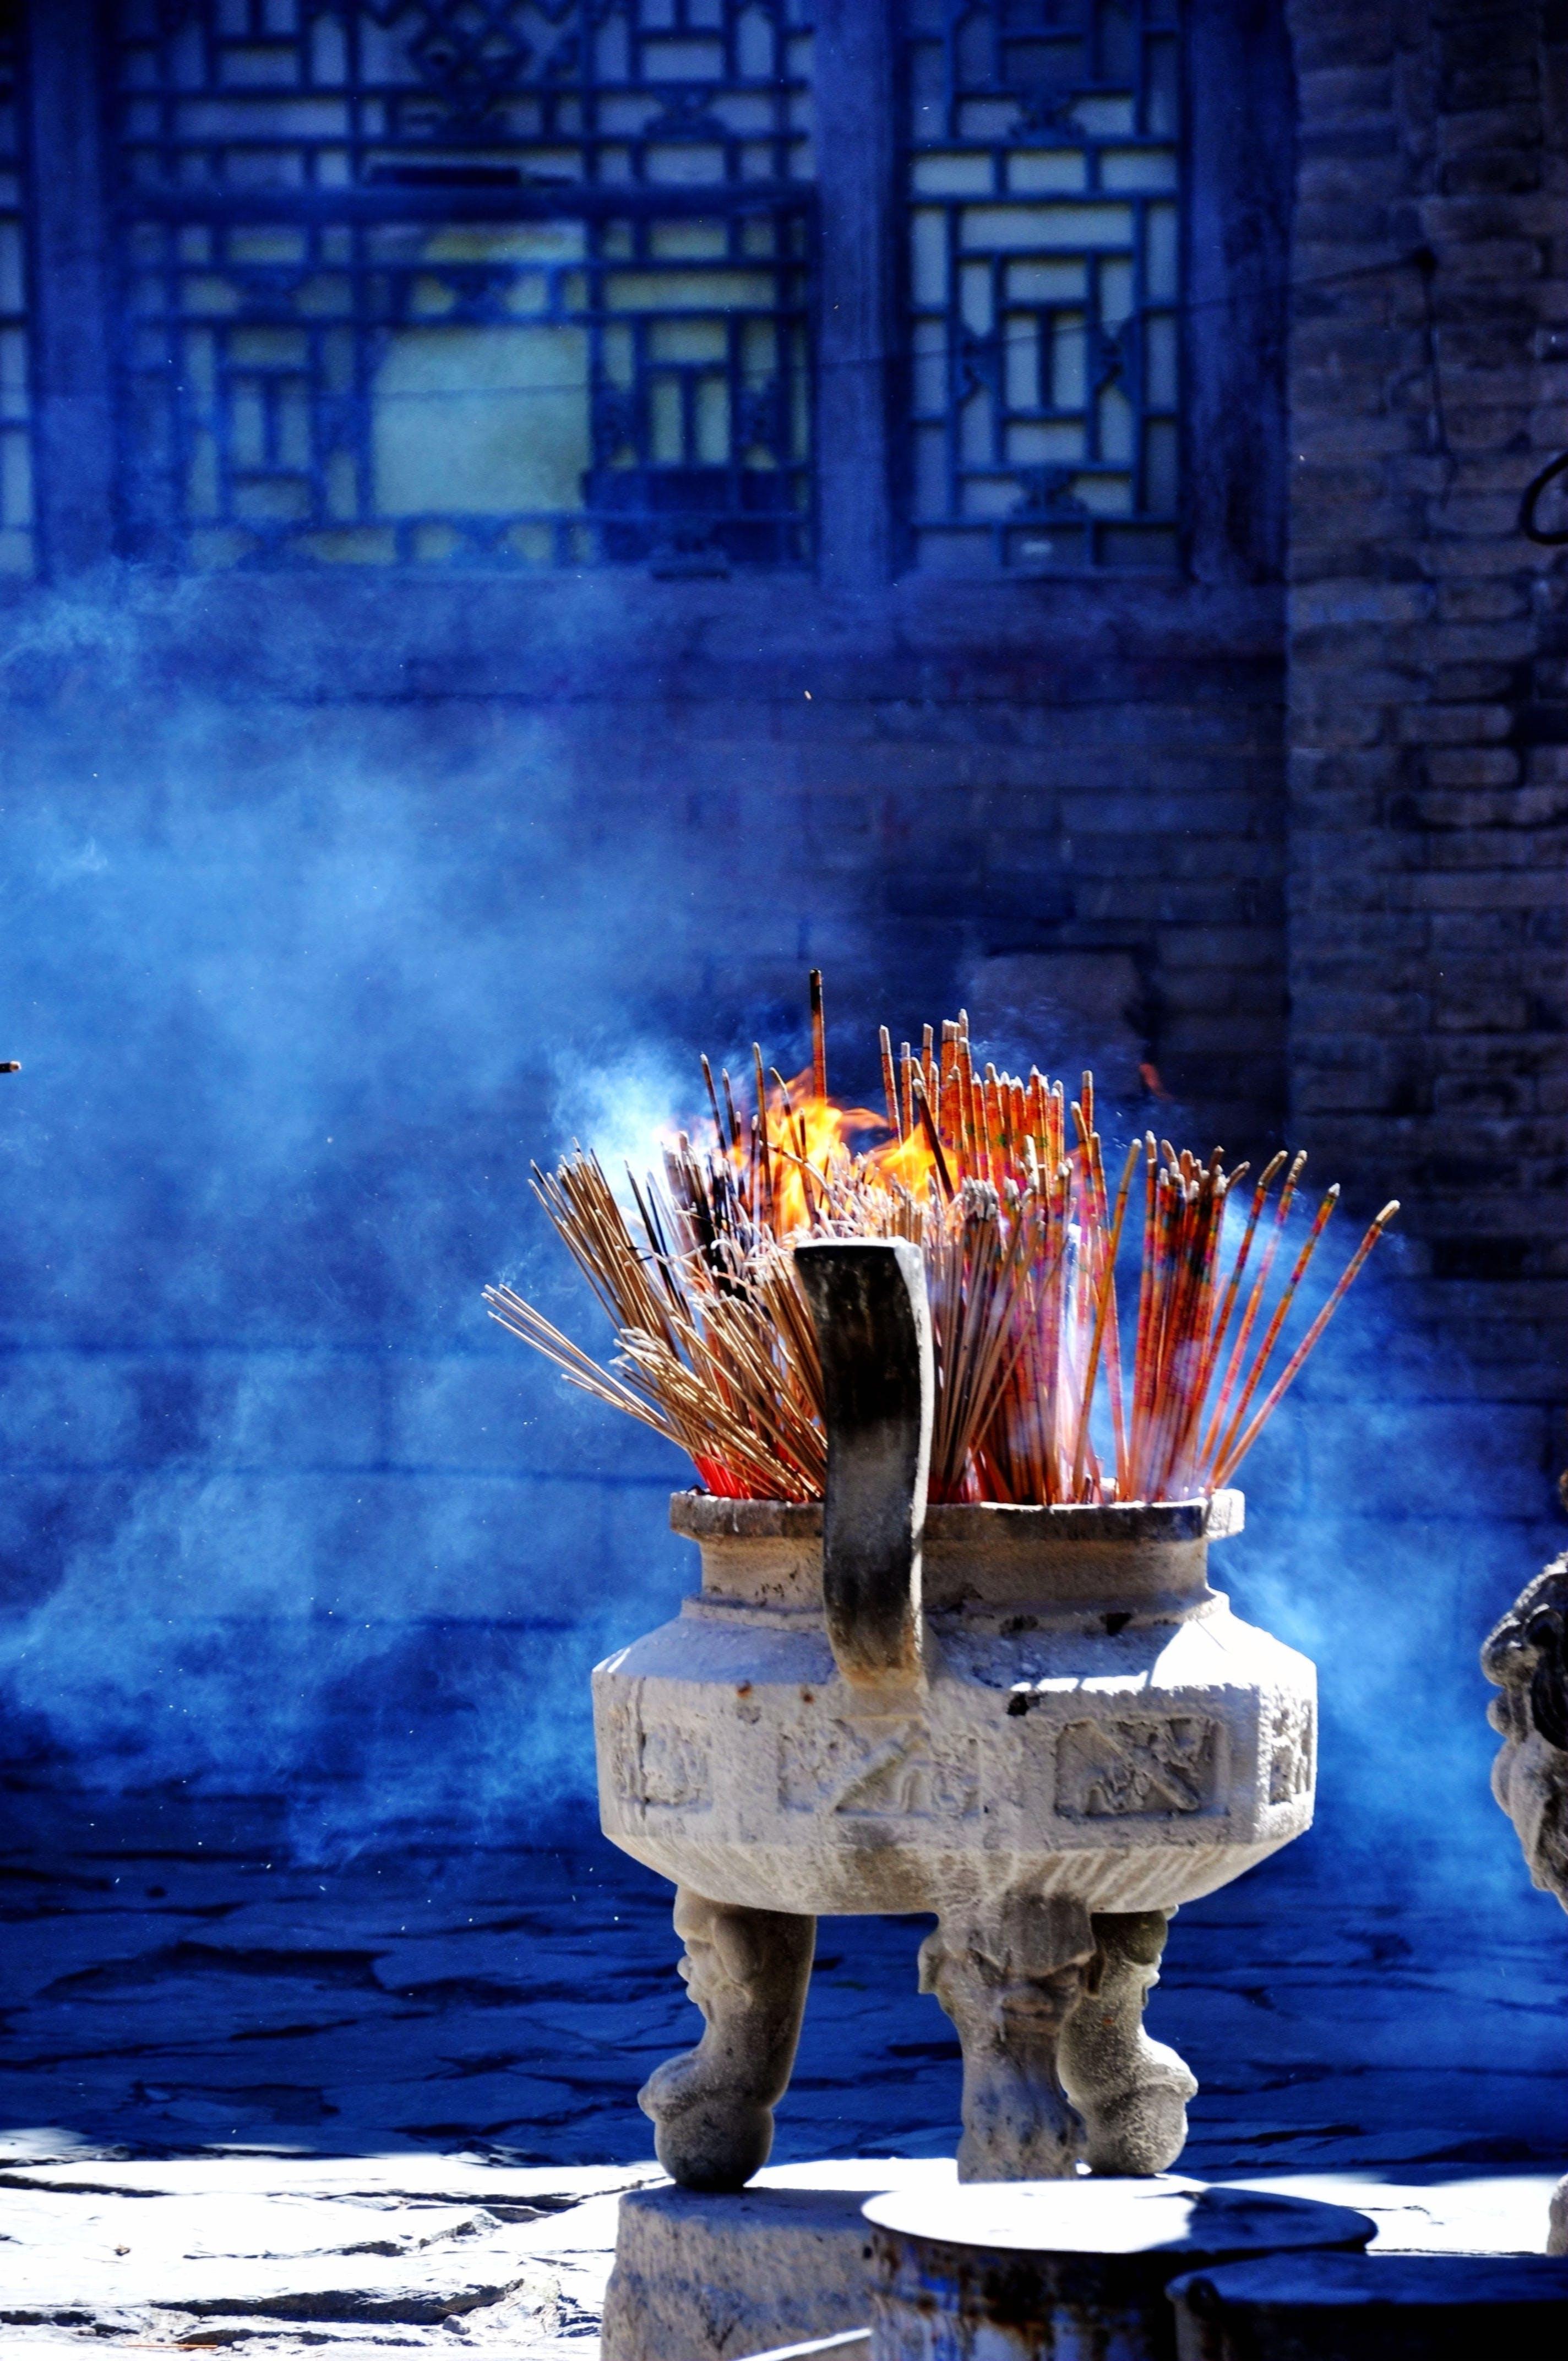 Free stock photo of smoke, Buddhism, incense burner